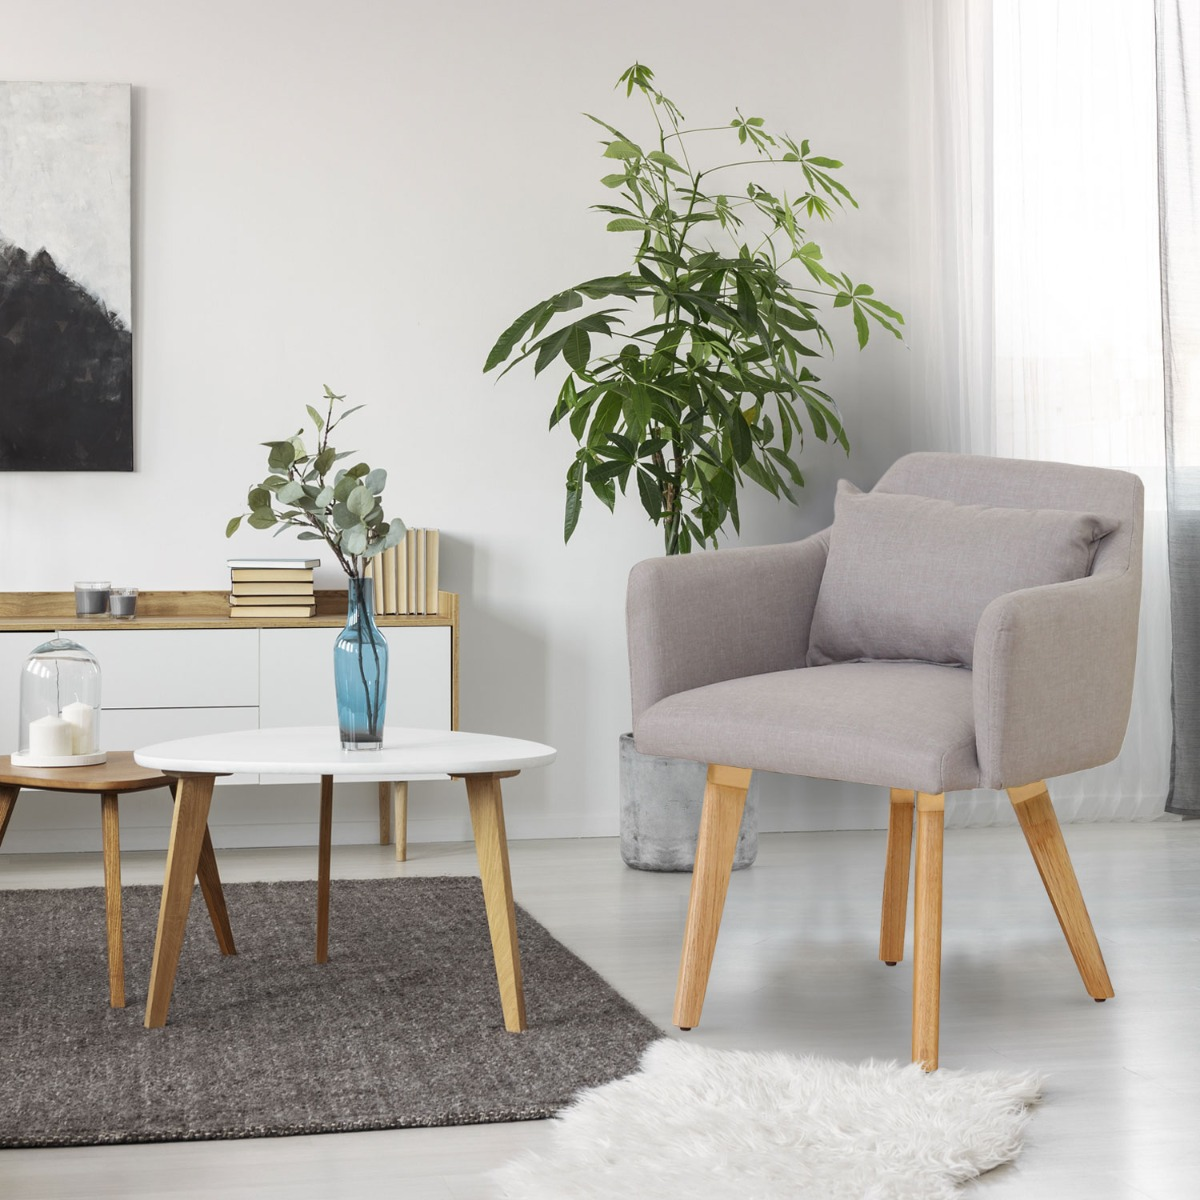 Lot de 20 chaises / fauteuils scandinaves Gybson Tissu Beige